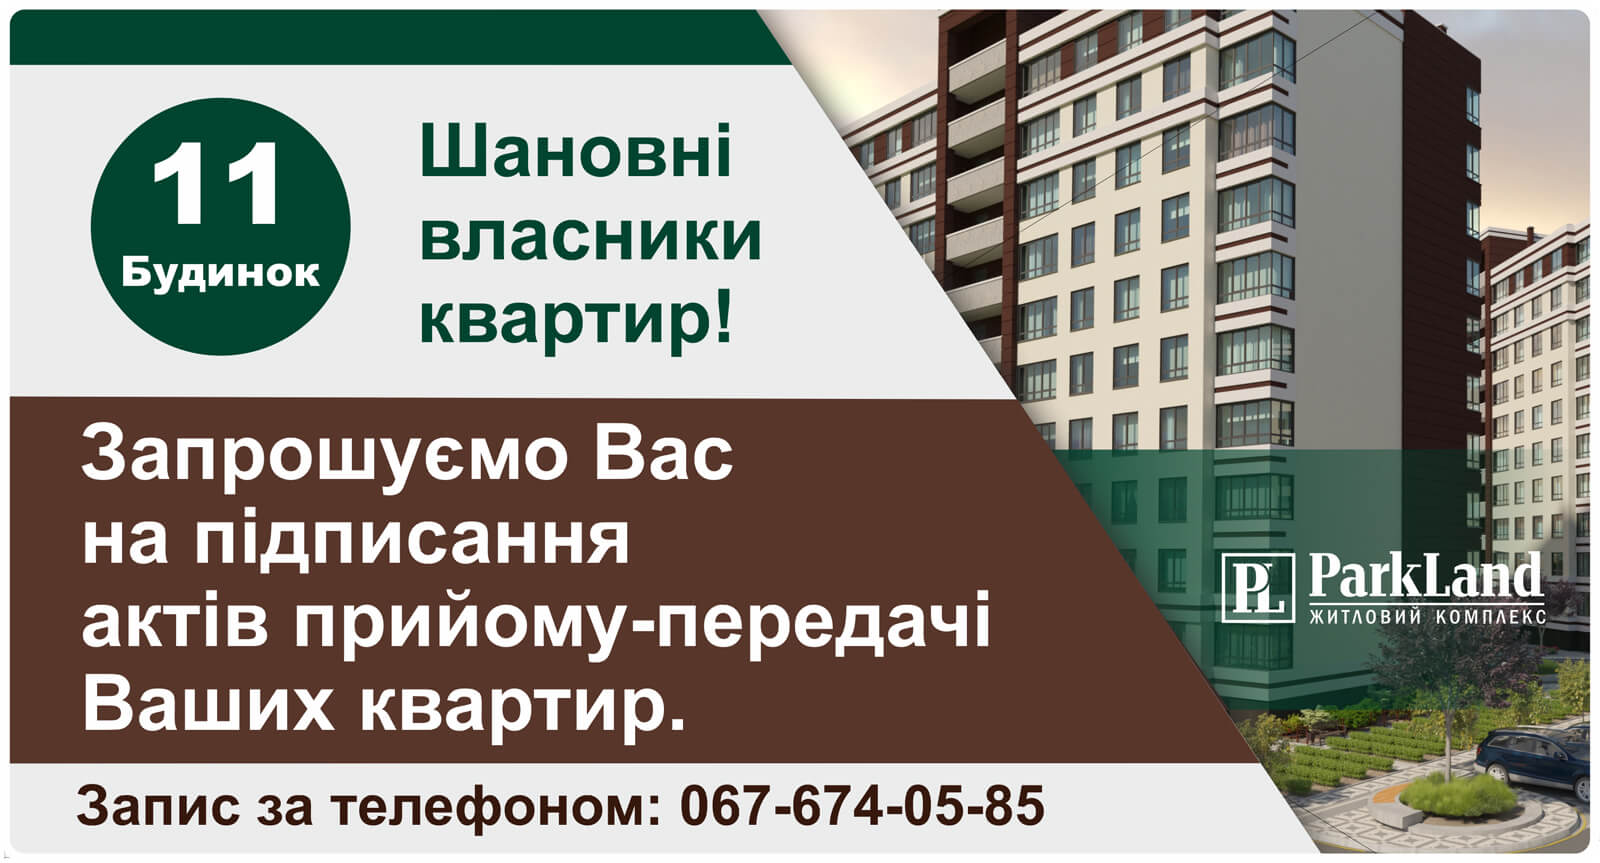 news11dom-0318-ukr